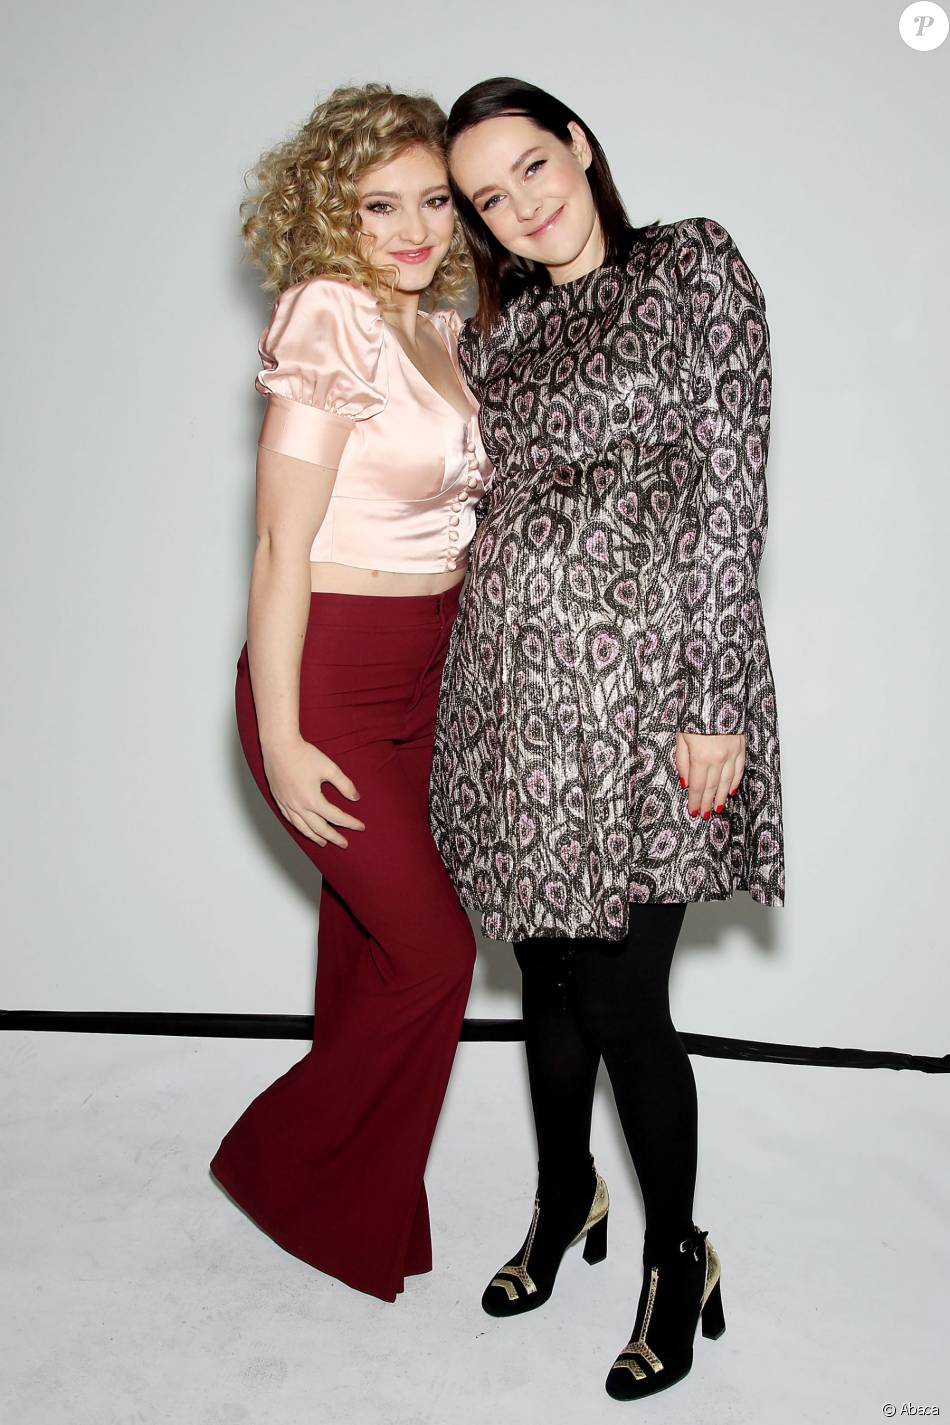 Willow Shields, Jena Malone - Défilé Jill Stuart lors de la New York Fashion Week le 13 février 2016